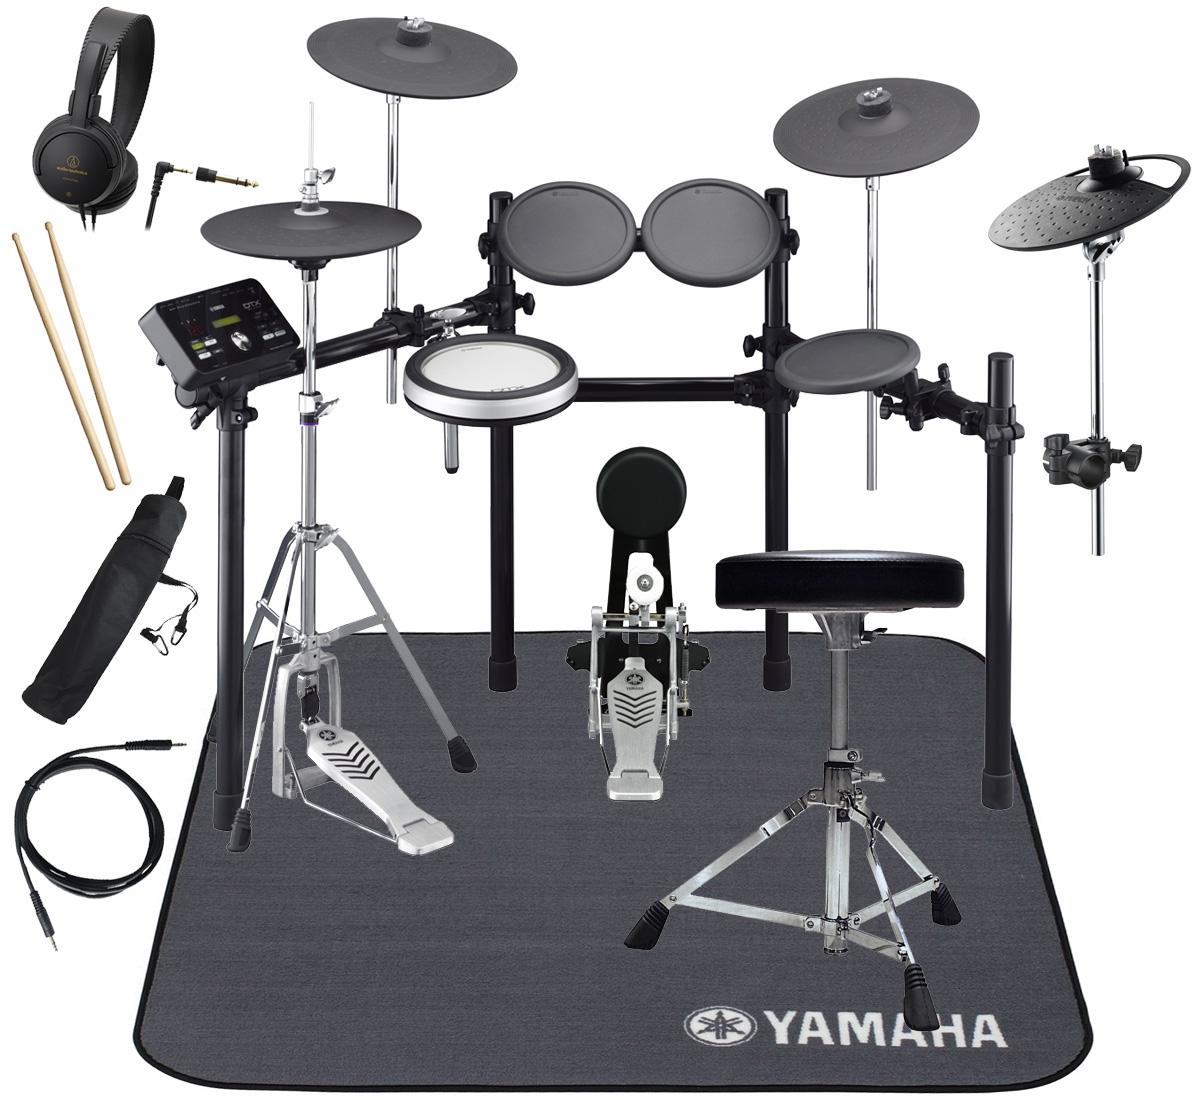 YAMAHA 電子ドラム DTX532KFS 3シンバル ドラムマットDM1314 スターターパック【YRK】